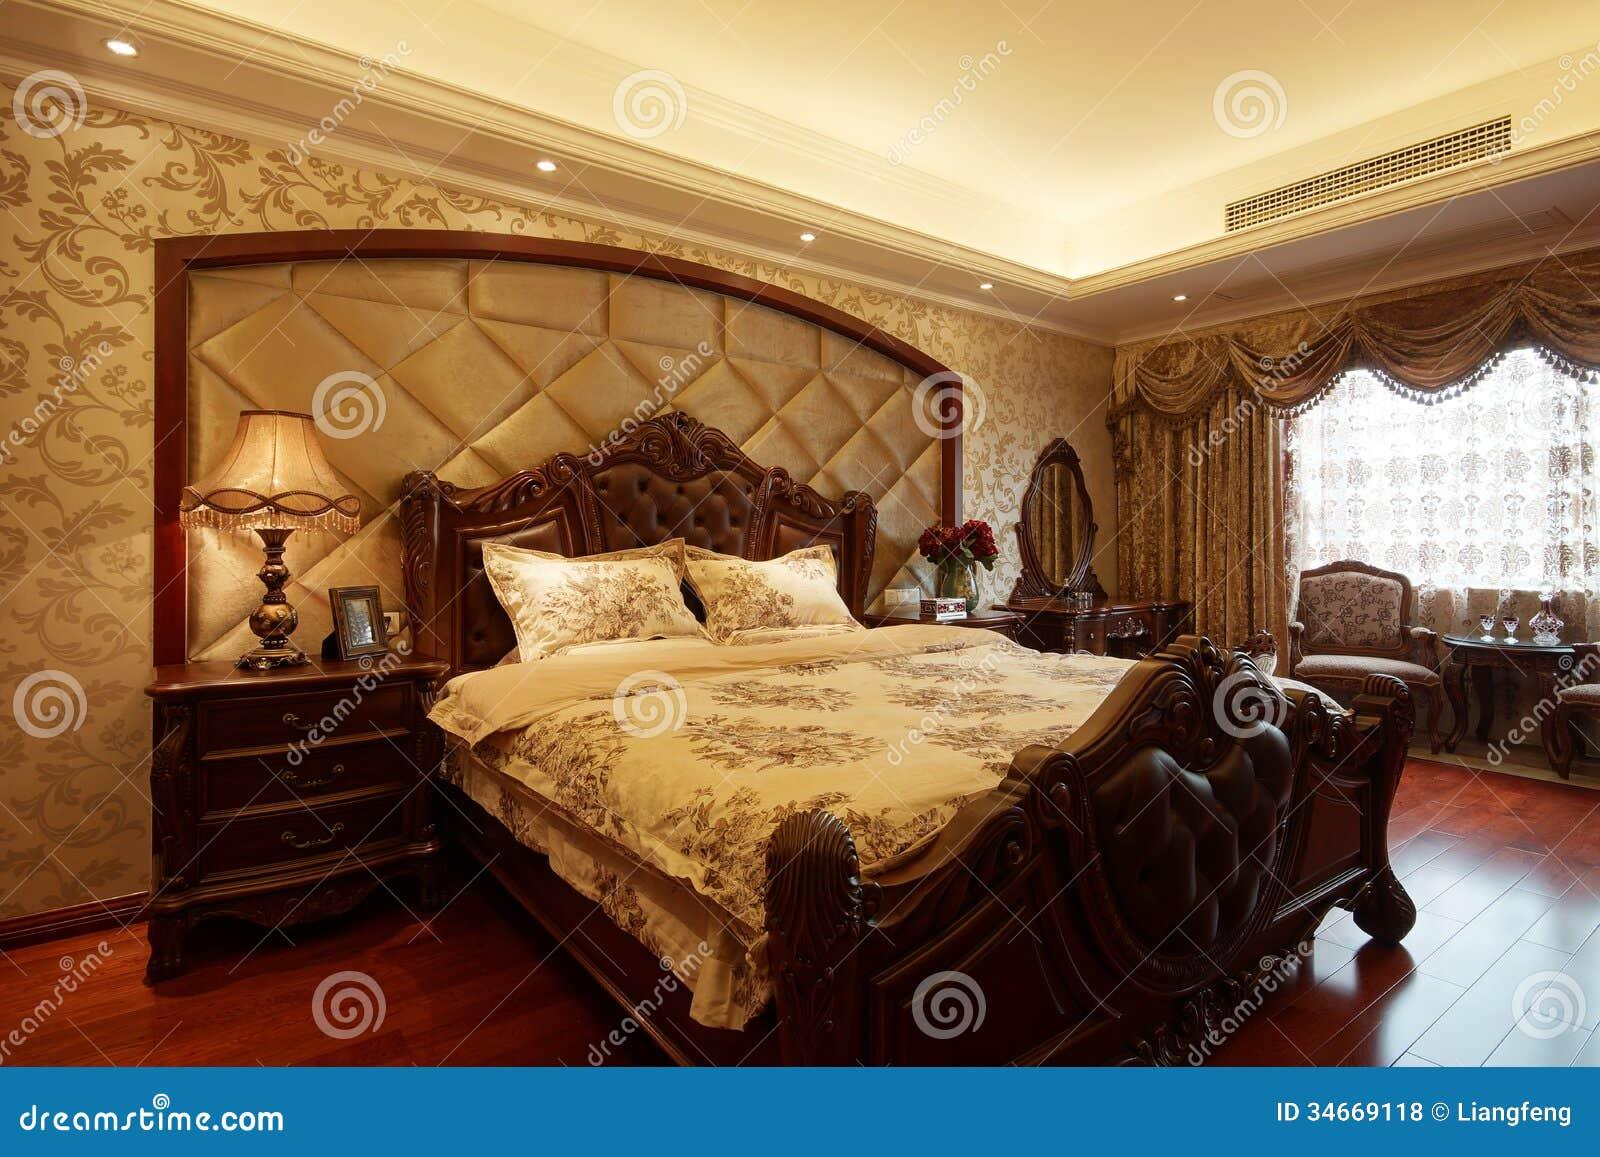 the cozy bedrooms royalty free stock photos - Cozy Bedrooms